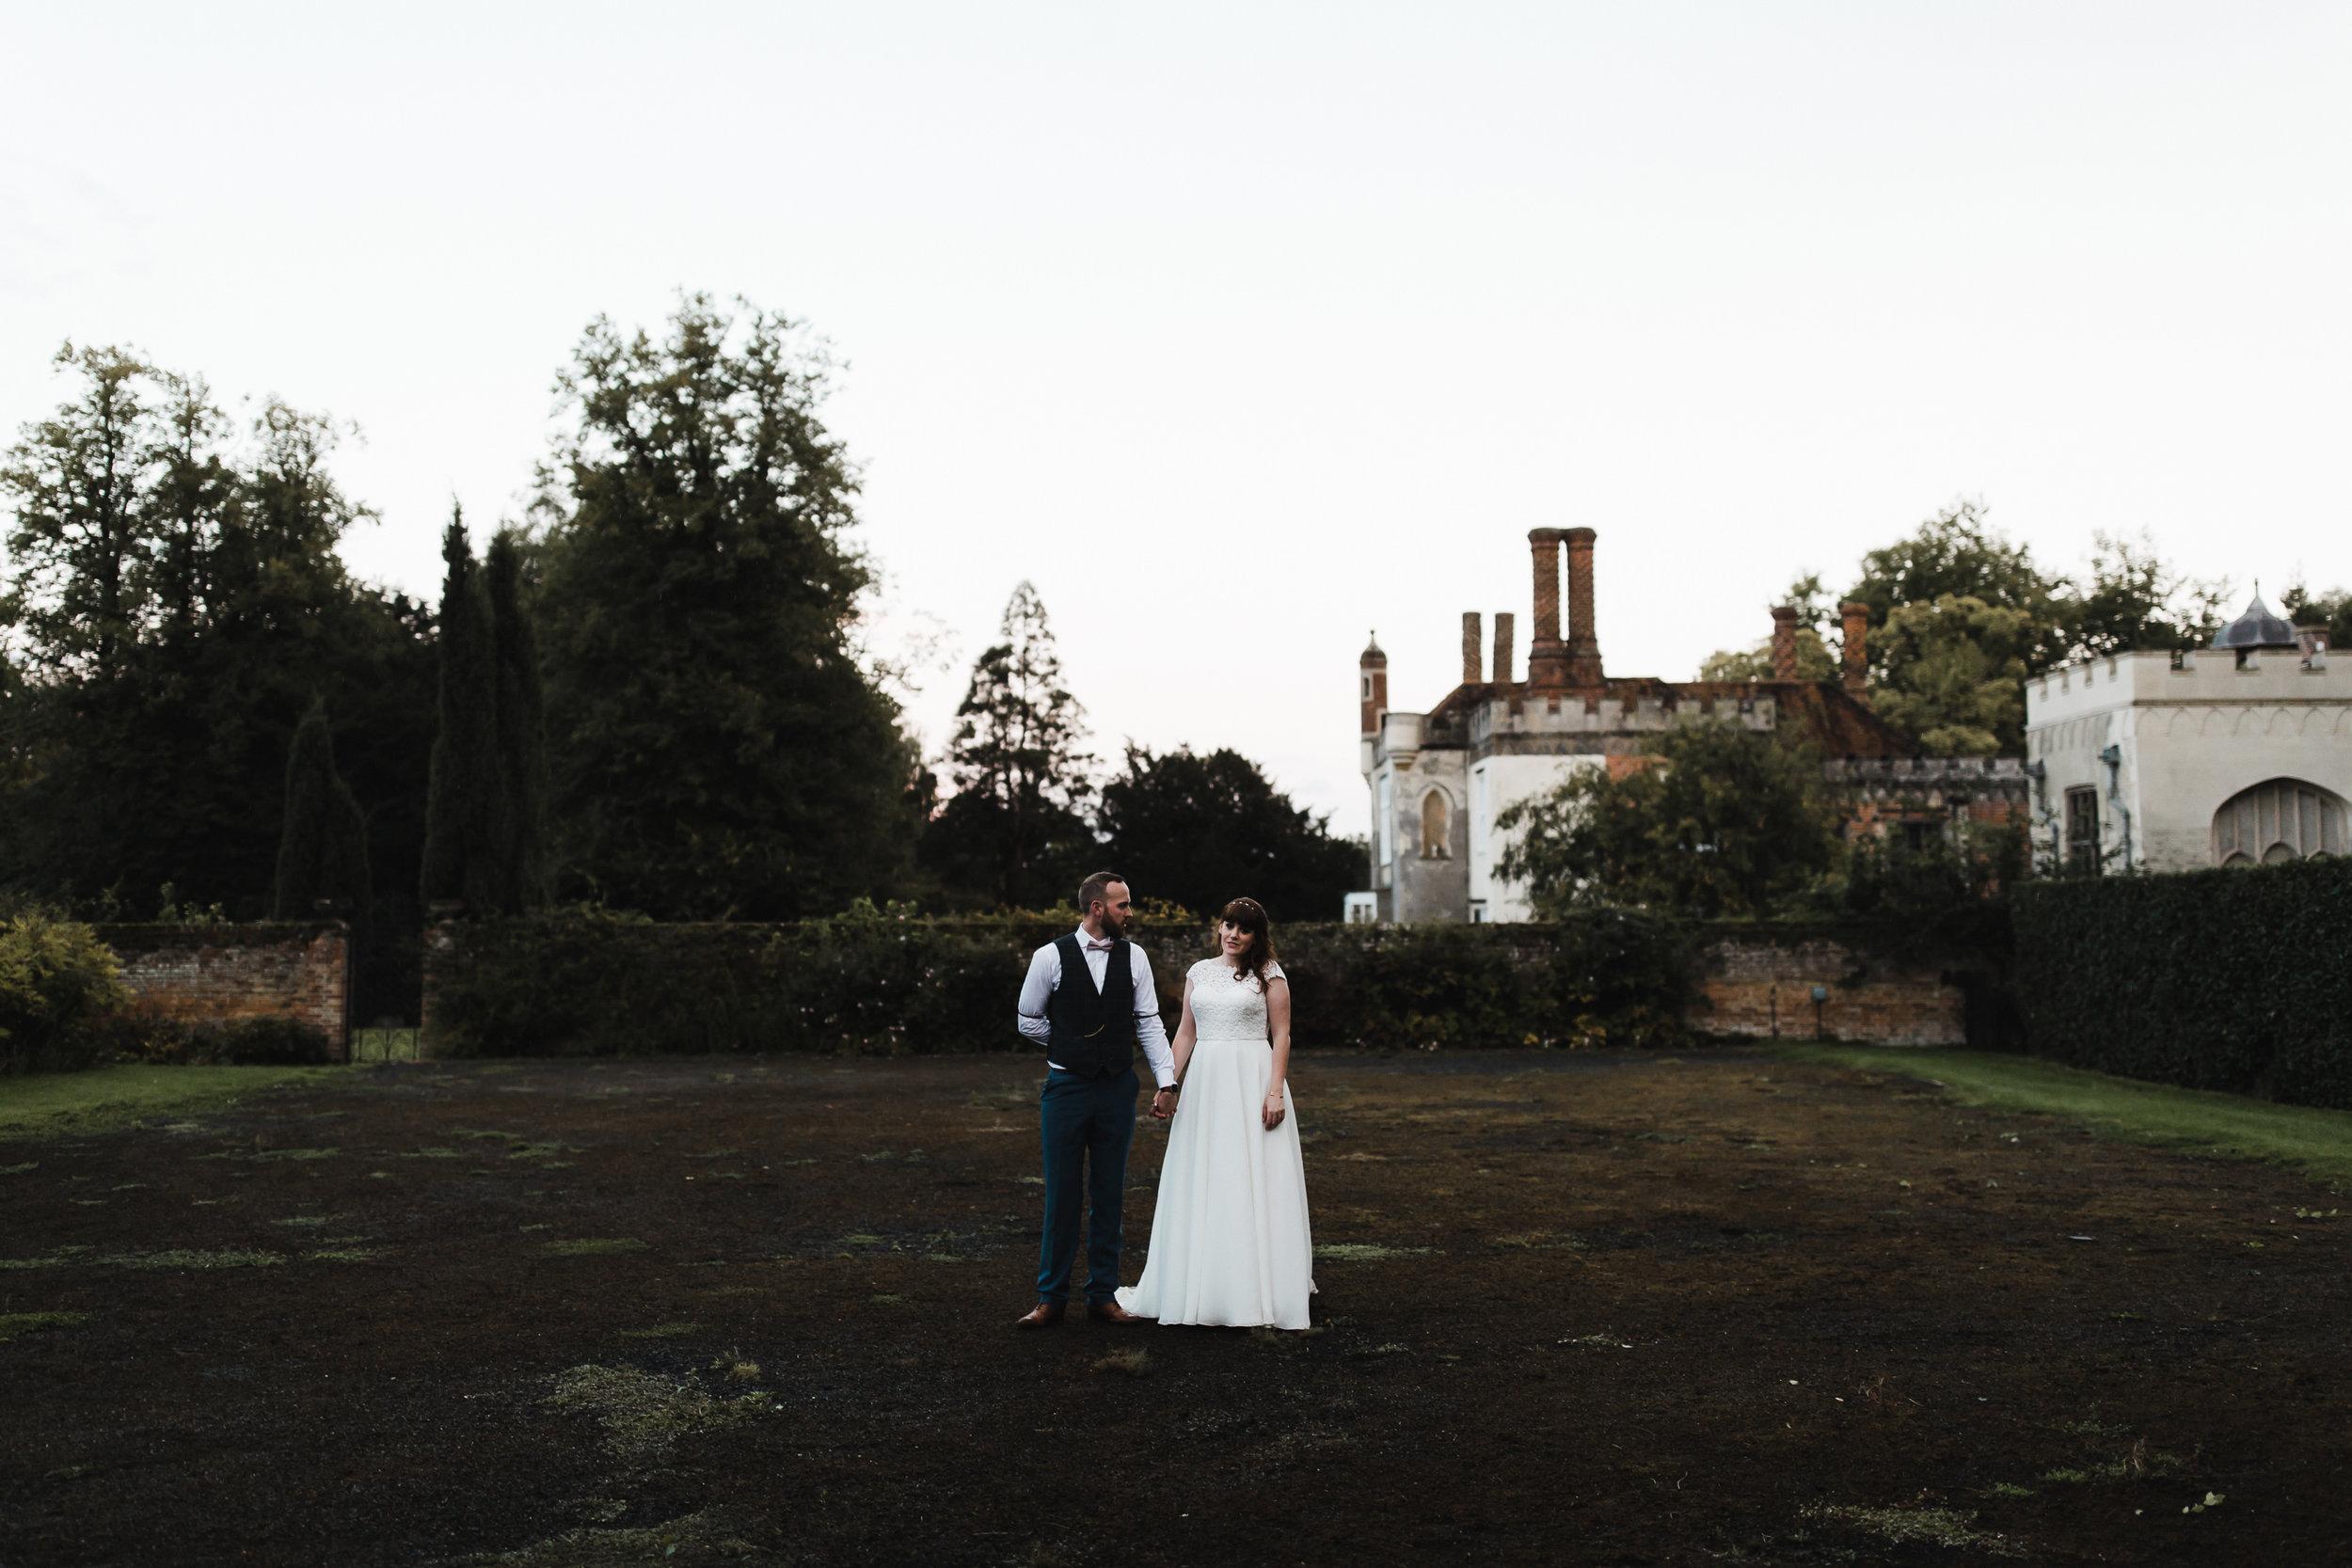 Nether_Wichendon_House_Wedding_085.jpg